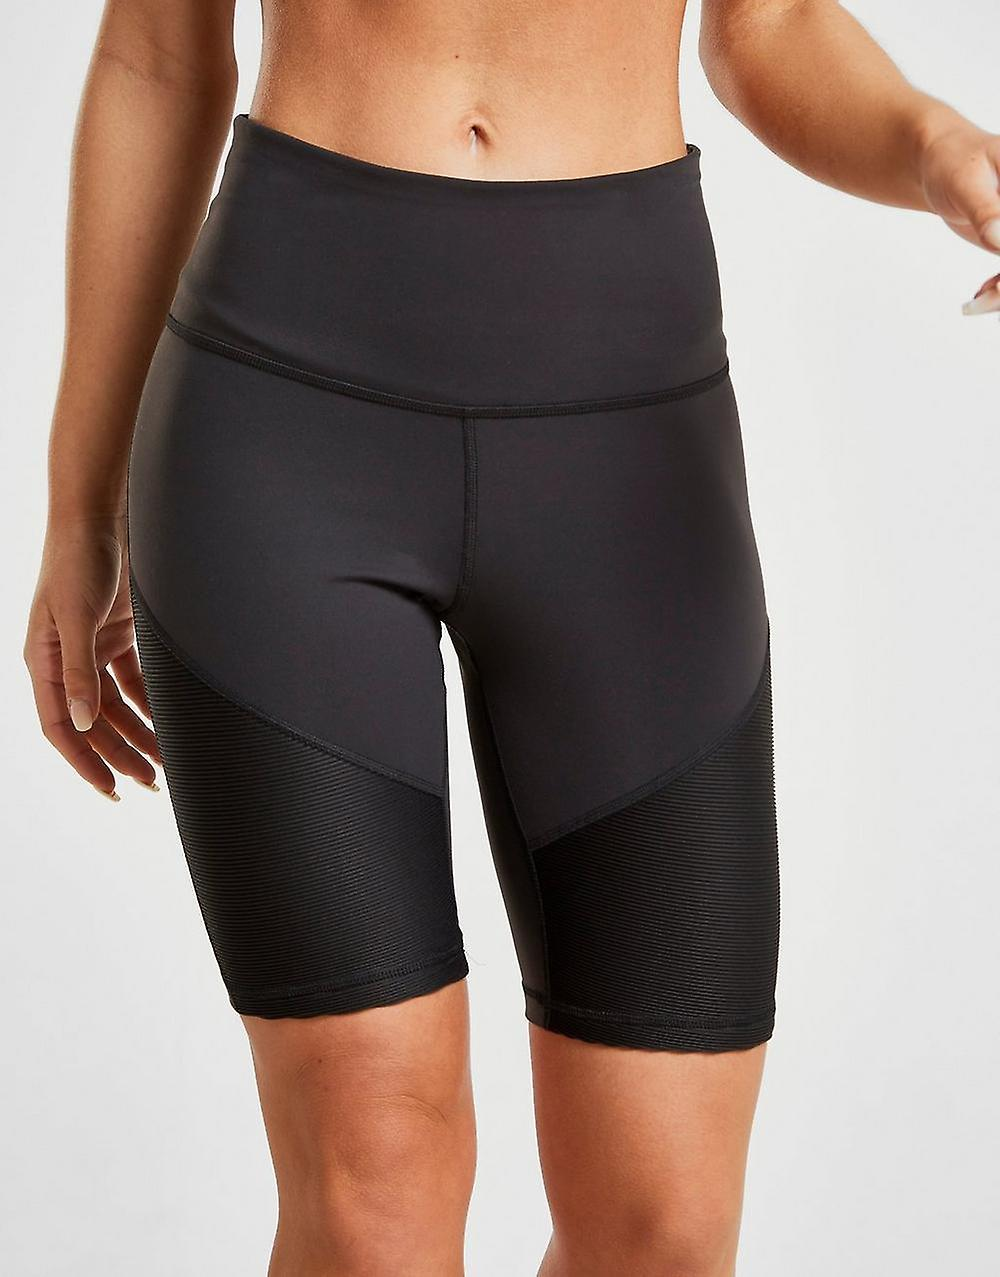 New Reebok Womens Mesh Cycle Shorts Black | Fruugo UK